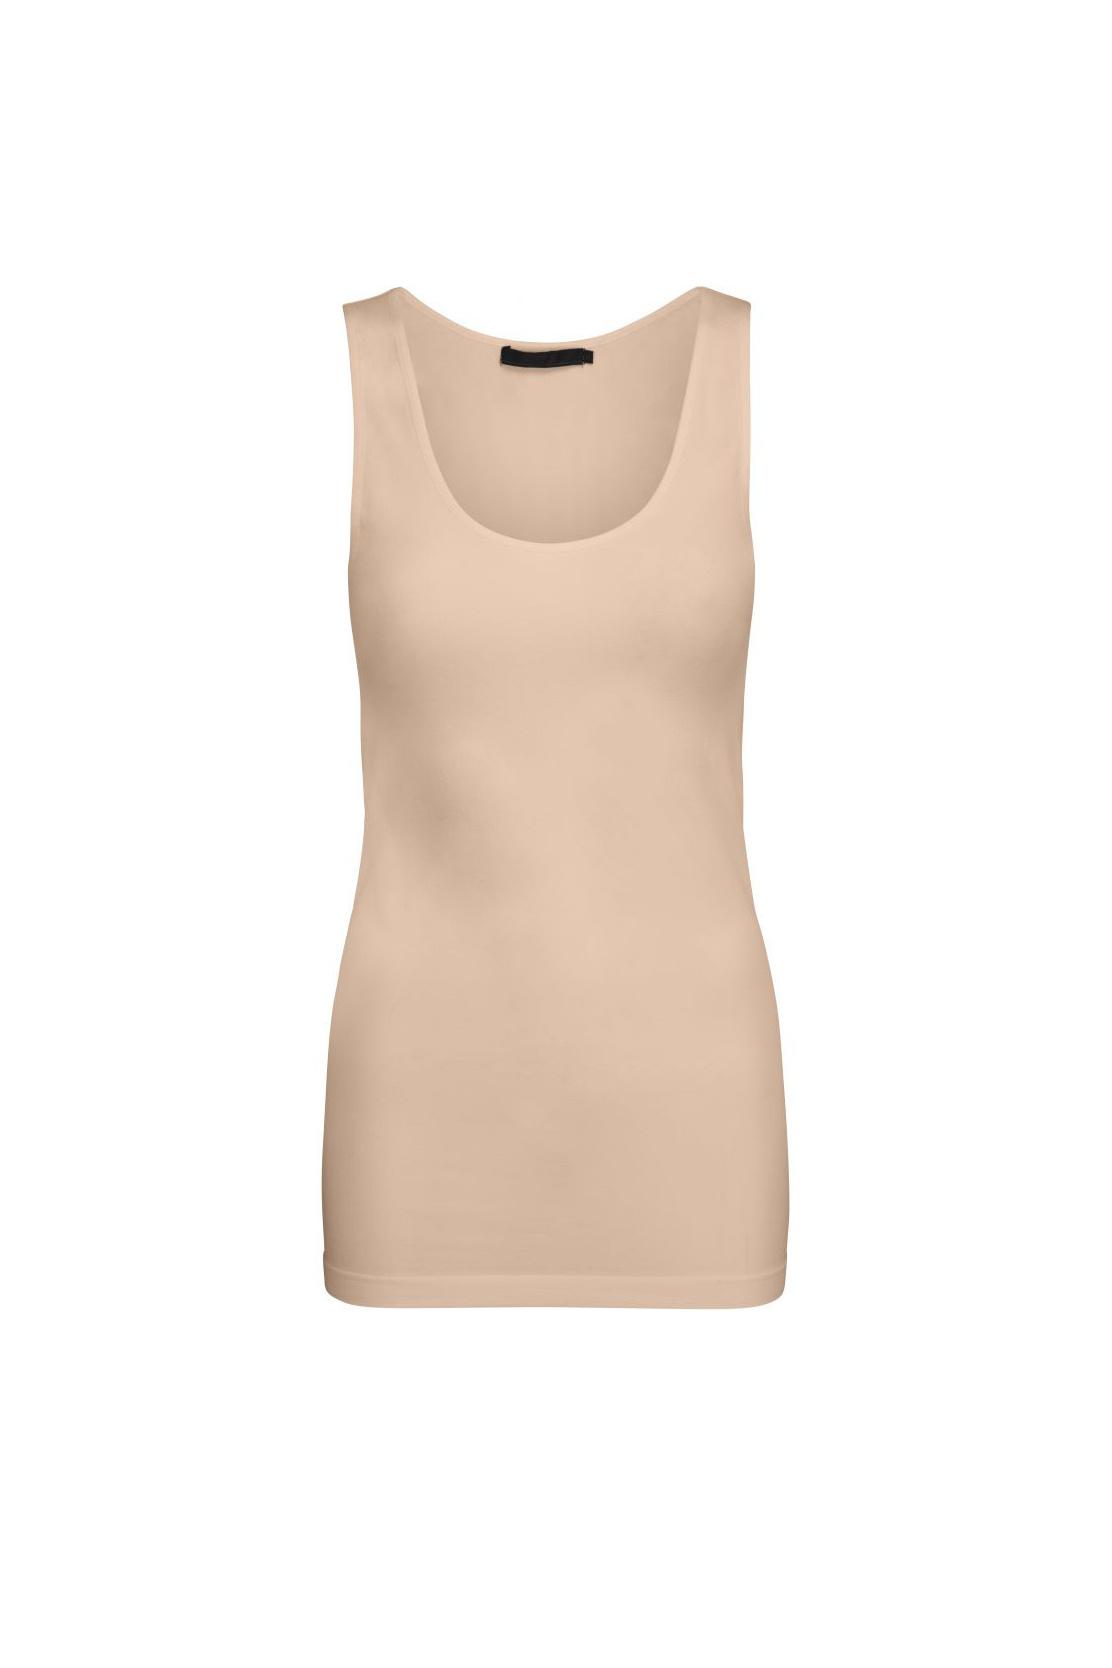 Clarice Top - Nude XL-1